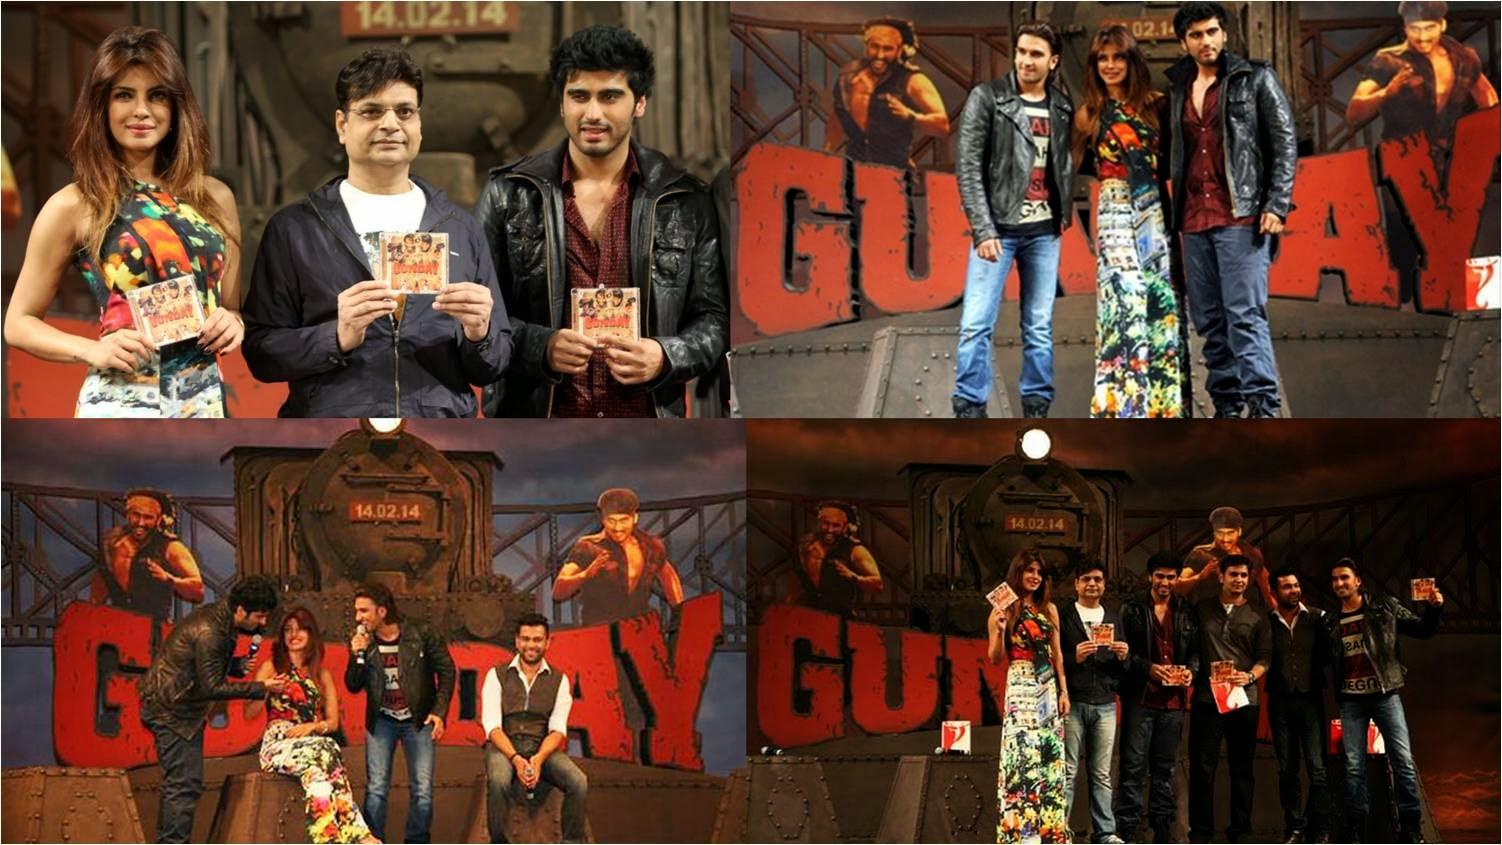 Gunday music launch event with Arjun Kapoor, Ranveer Singh and Priyanka Chopra